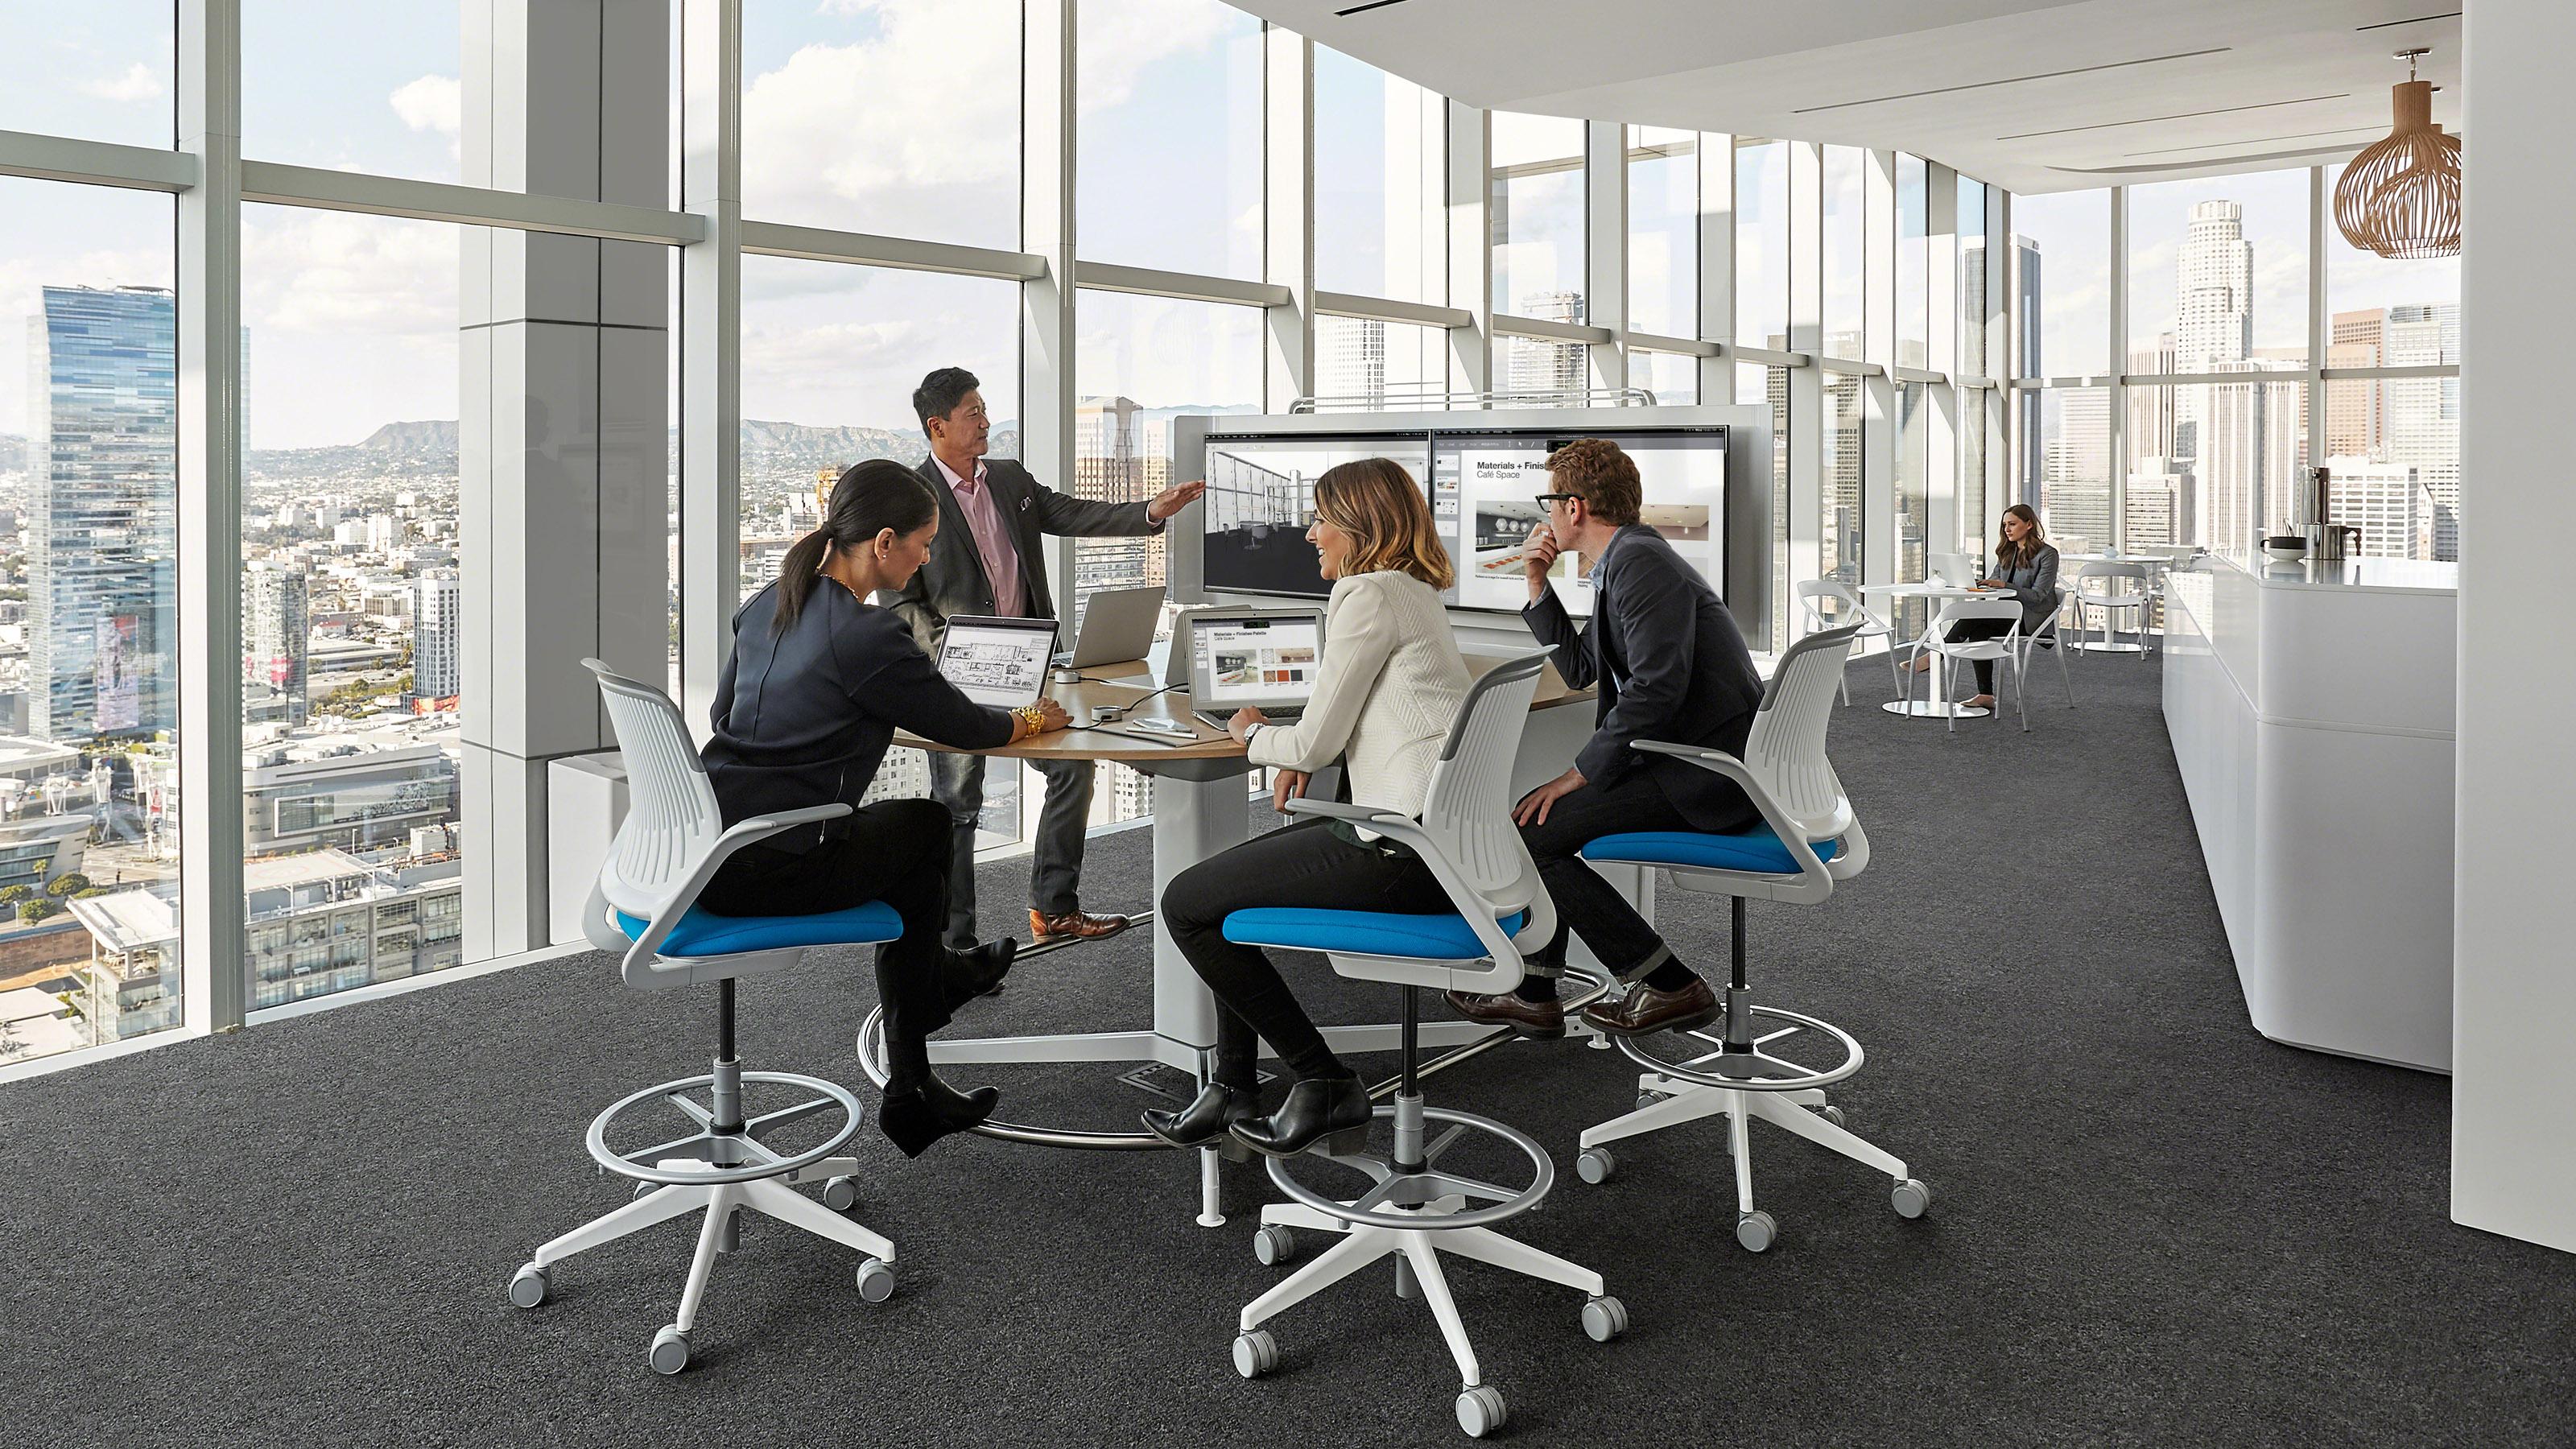 Ergonomic Office Chair Hight